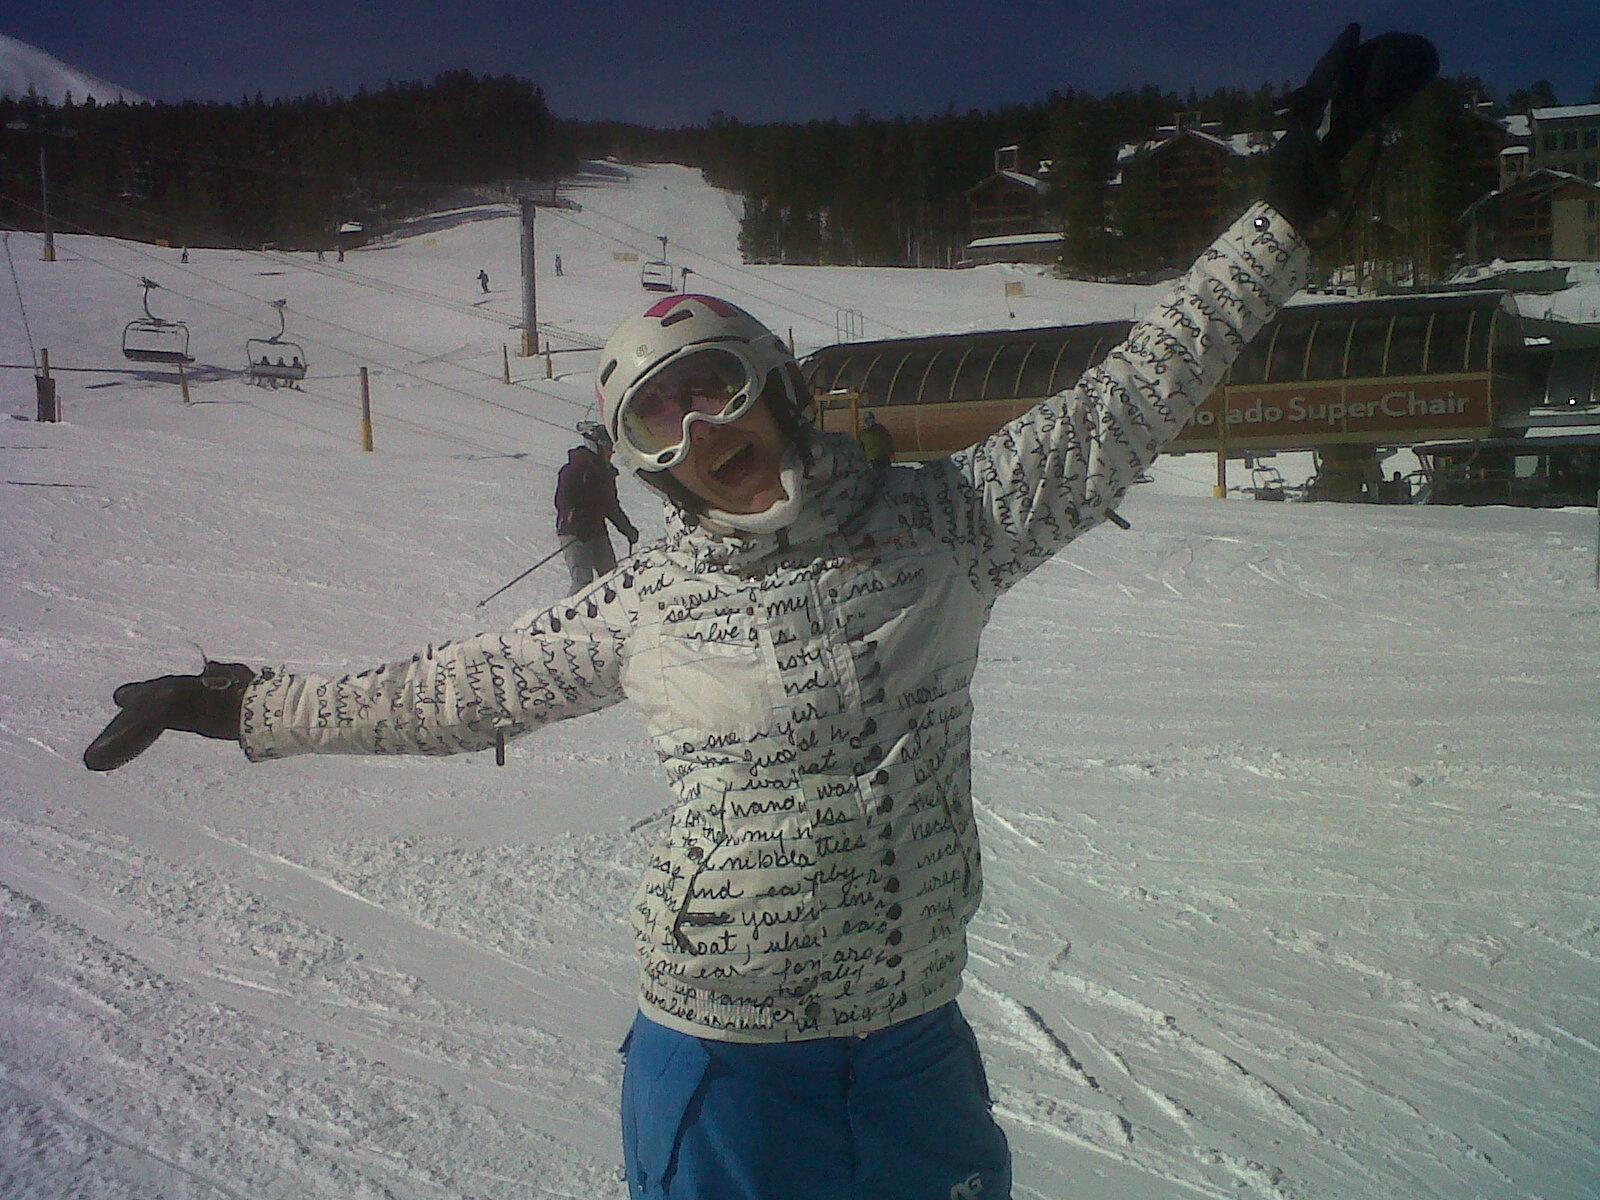 Mel on a snowboard